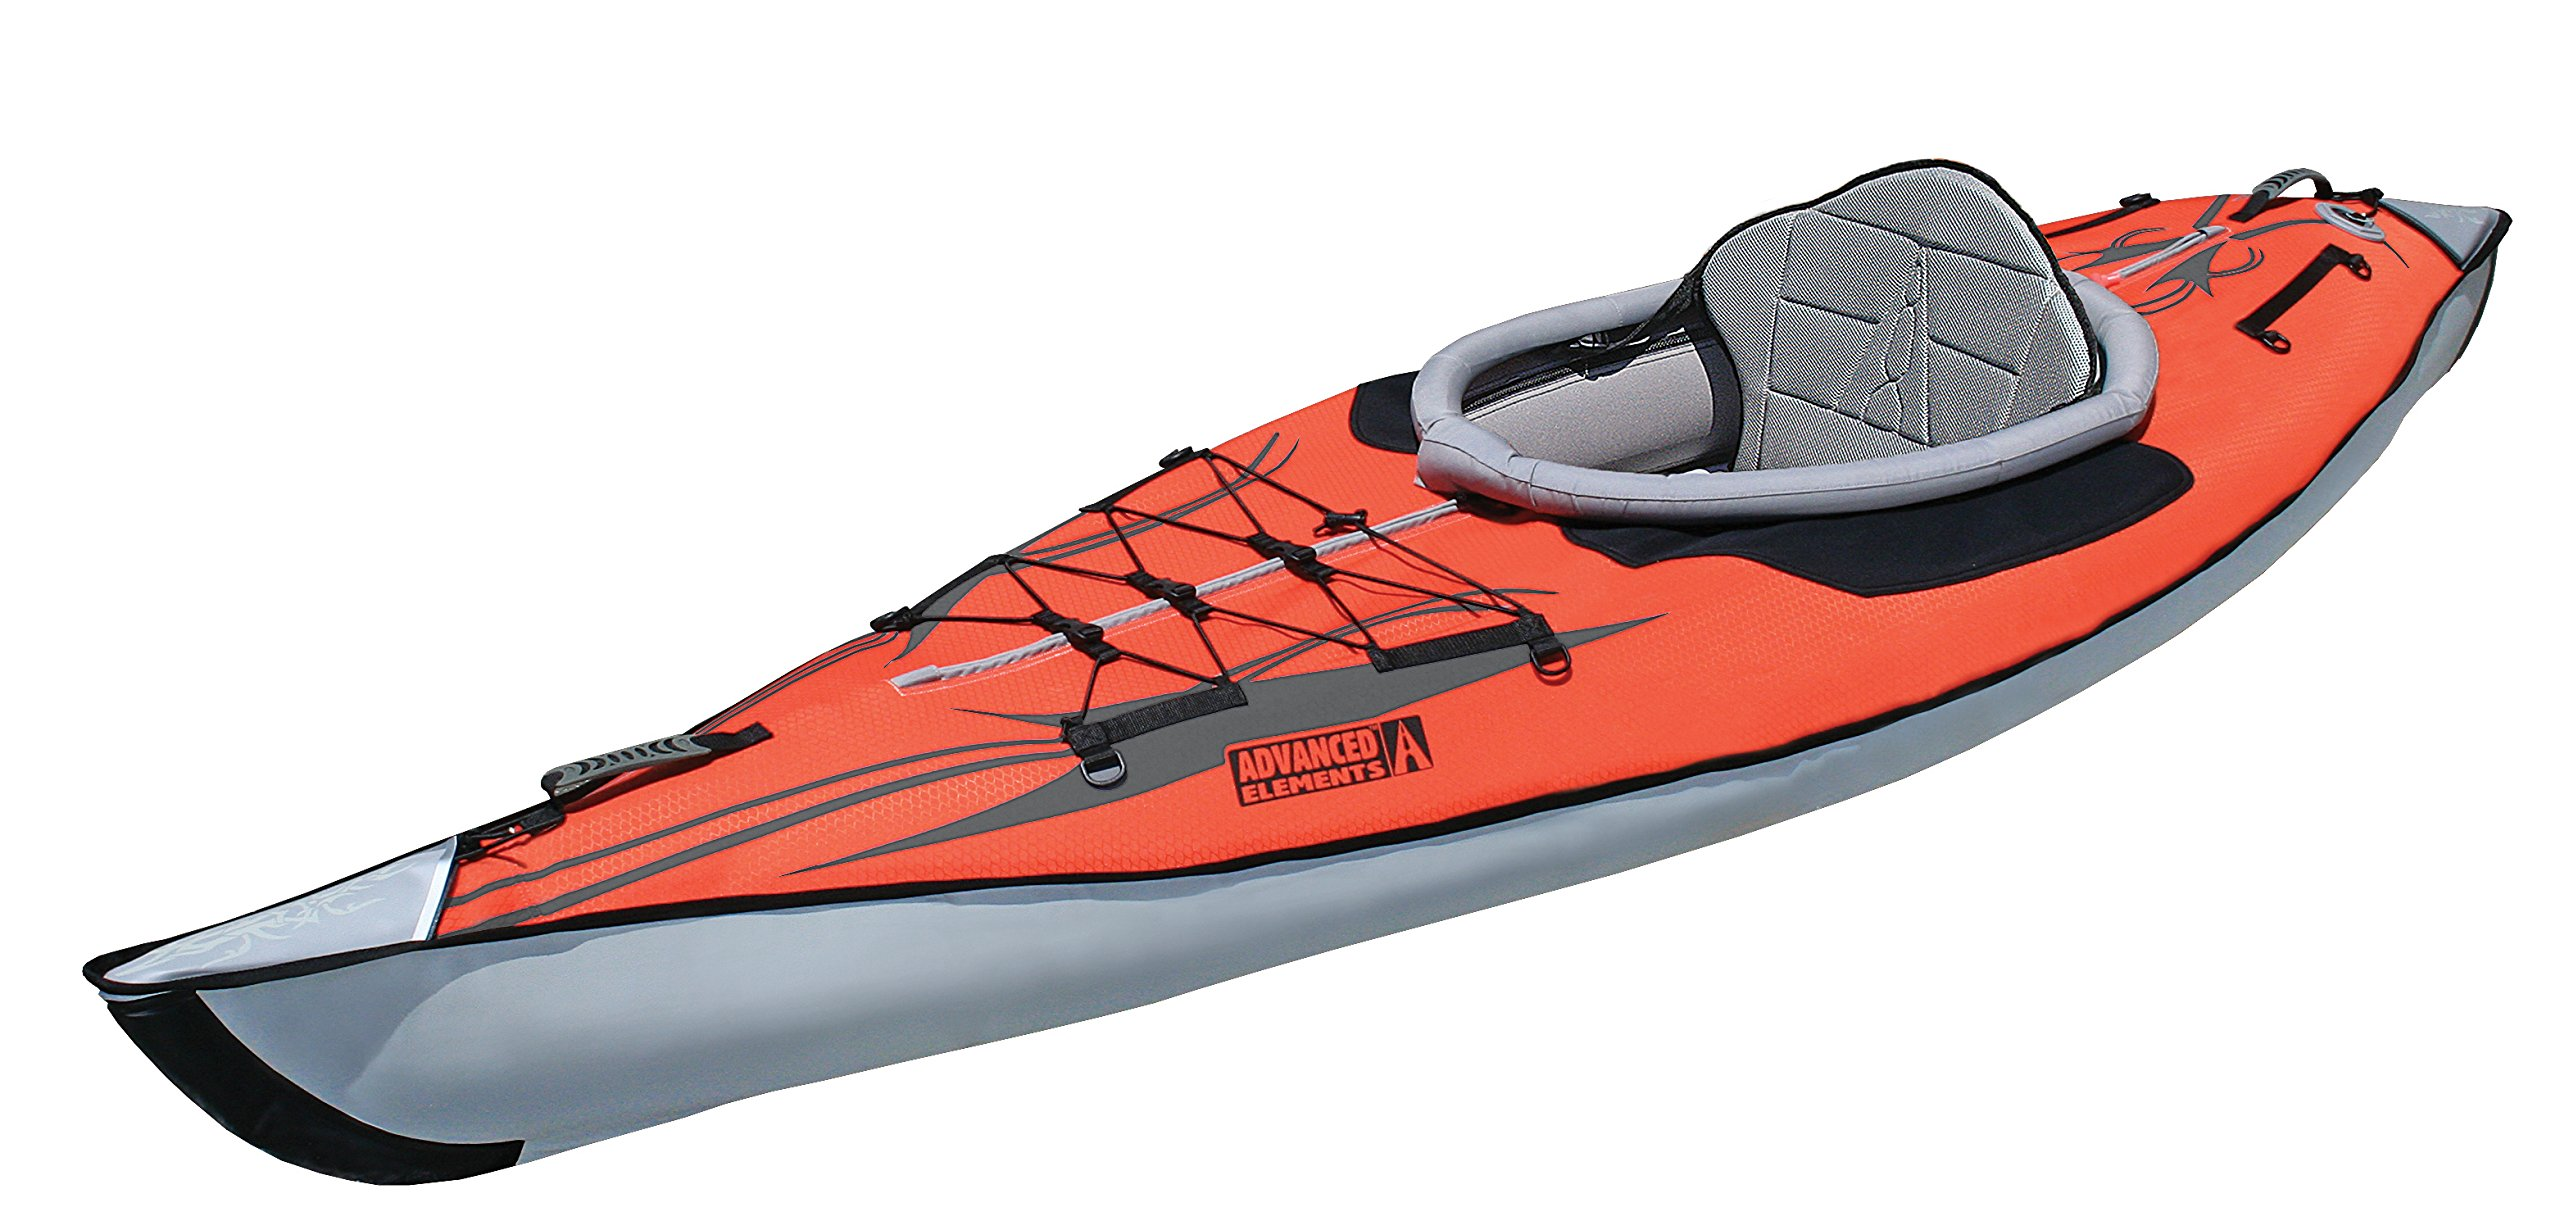 Advanced Elements AE1012-R AdvancedFrame Inflatable Kayak by ADVANCED ELEMENTS